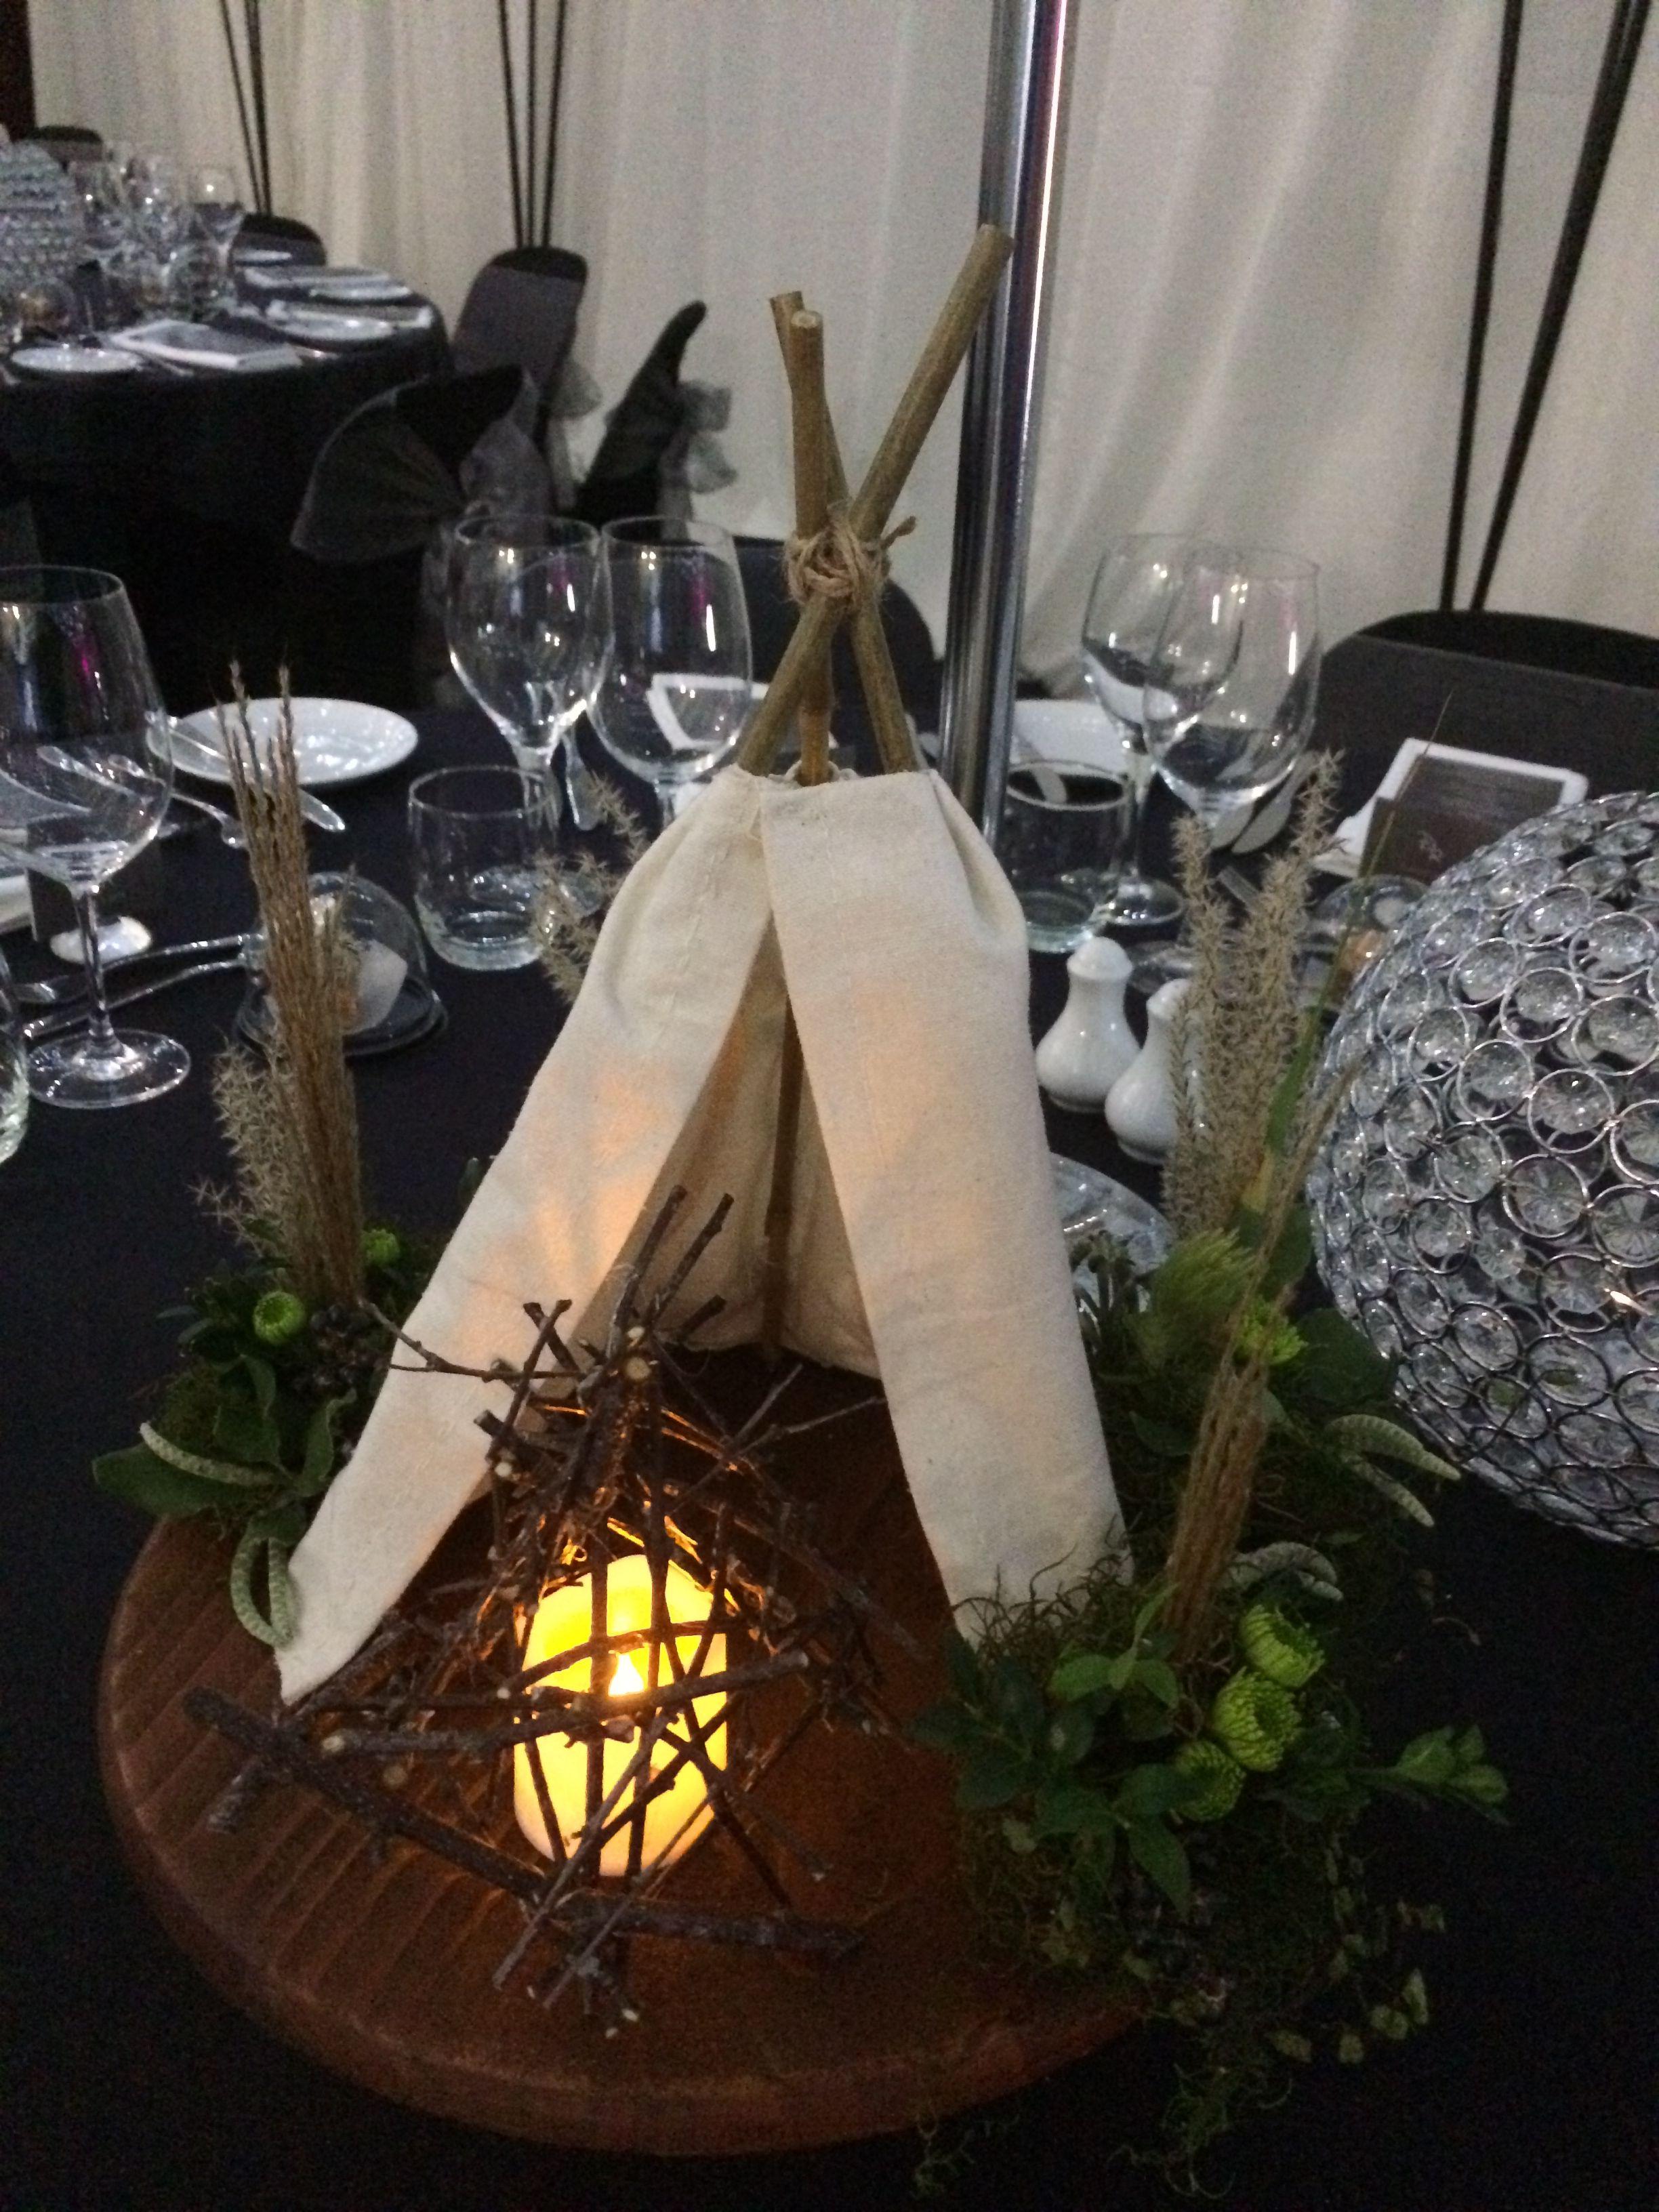 Pocahontas themed wedding table arrangement created by florist pocahontas themed wedding table arrangement created by florist ilene httpfloristilene junglespirit Image collections